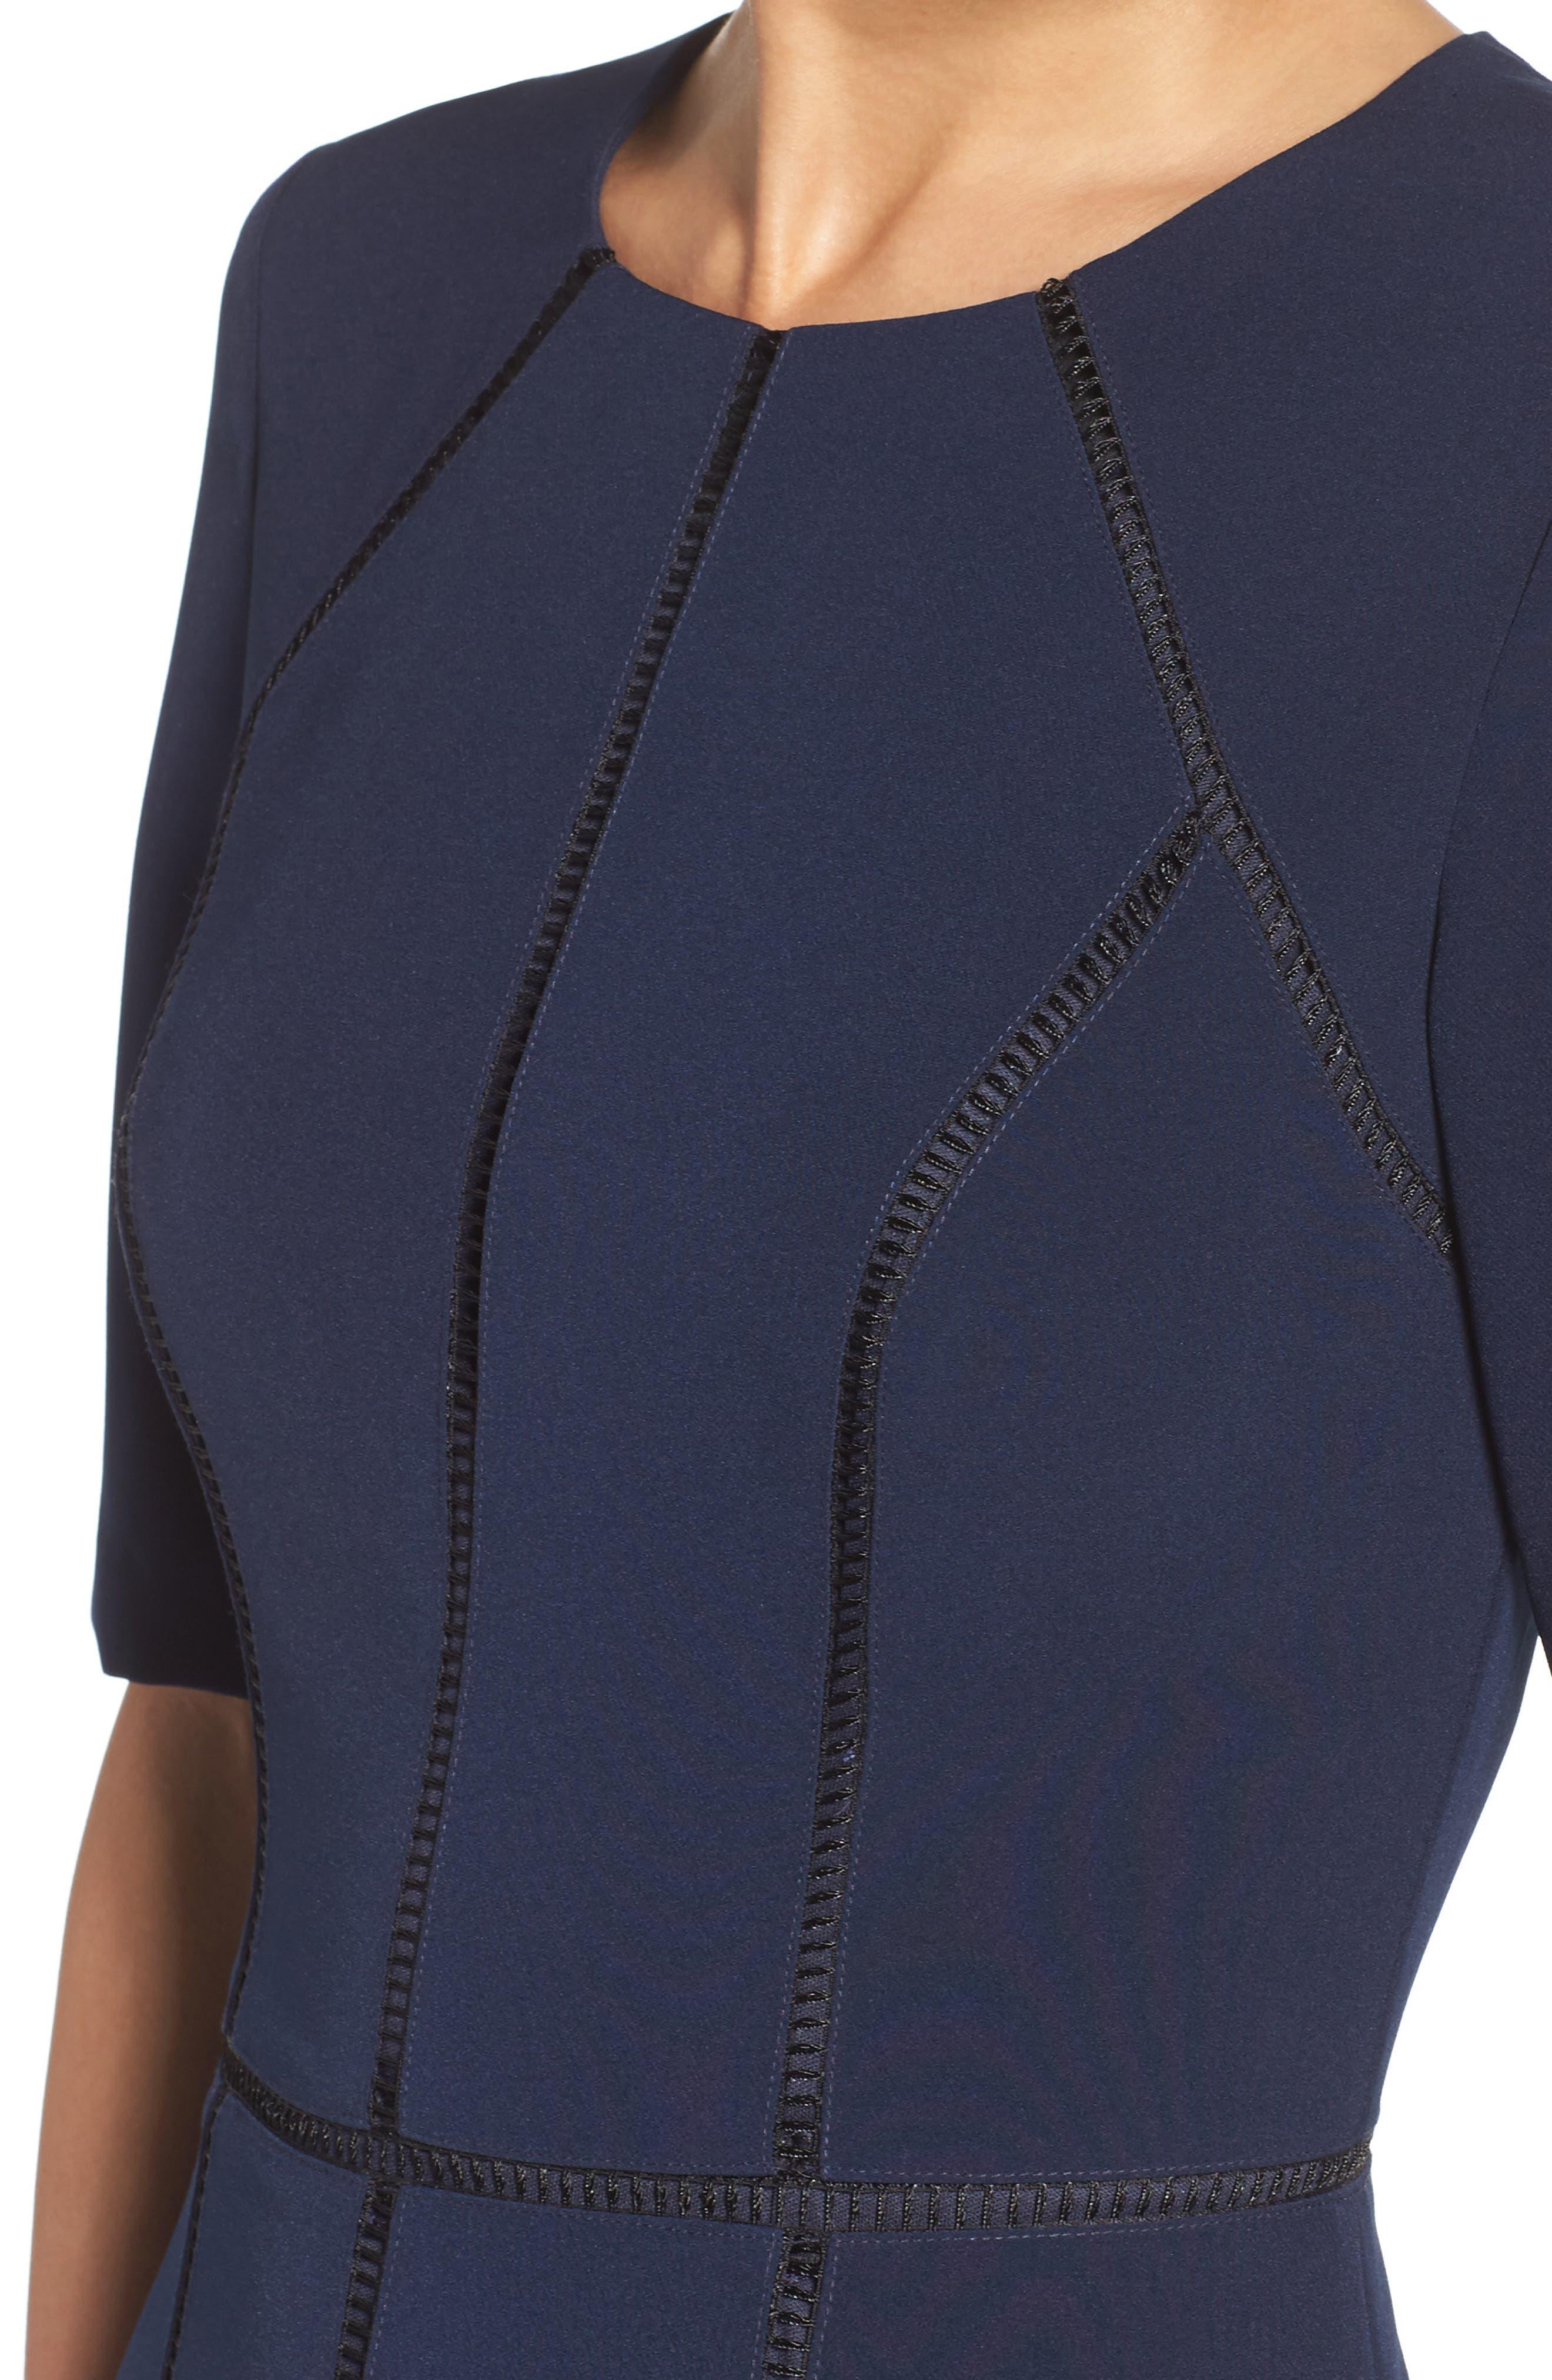 Solid Dream Crepe Dress,                             Alternate thumbnail 4, color,                             Patriot Blue